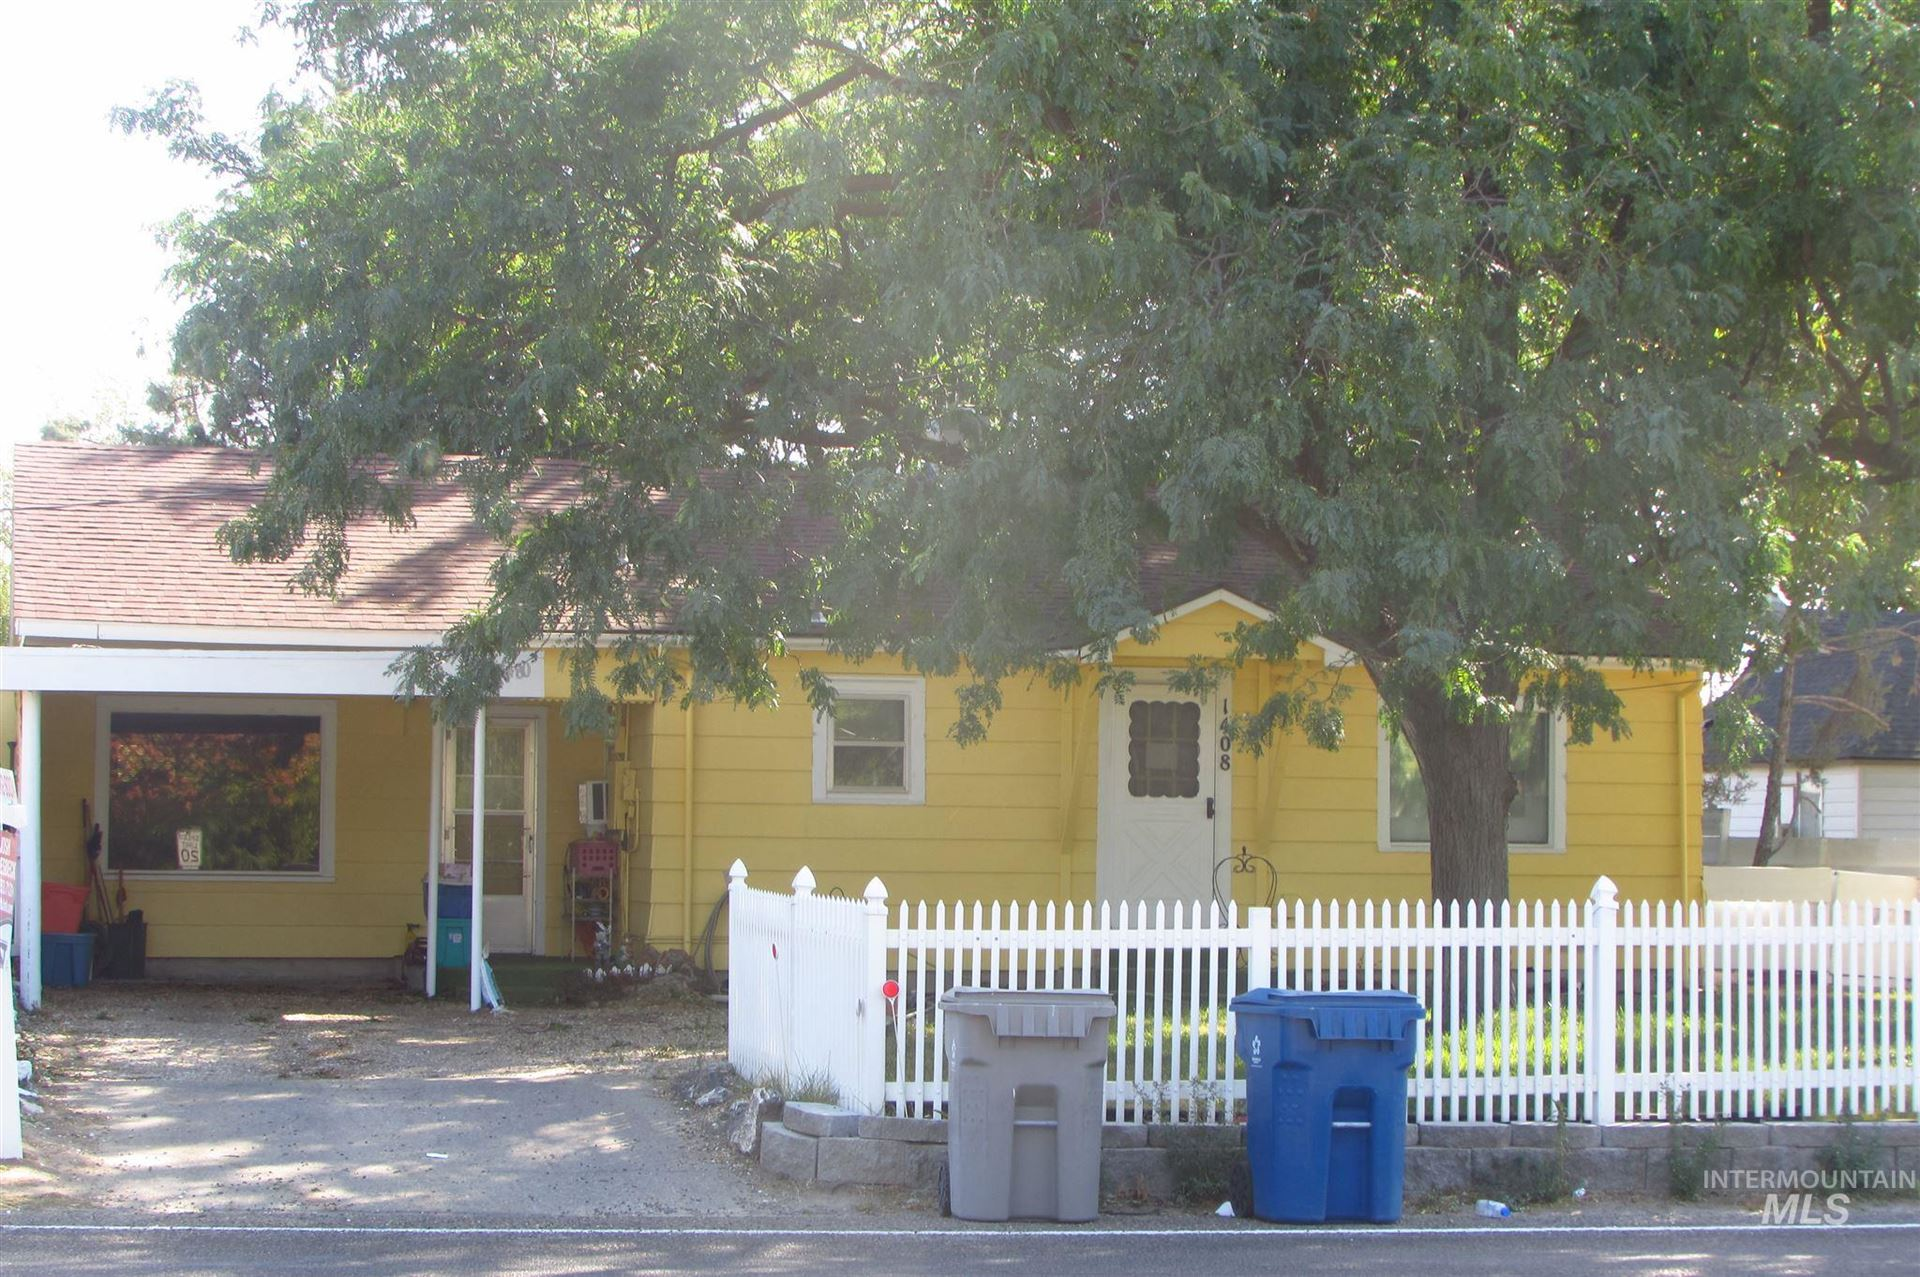 1408 Southside Blvd., Nampa, ID 83686 - MLS#: 98780196